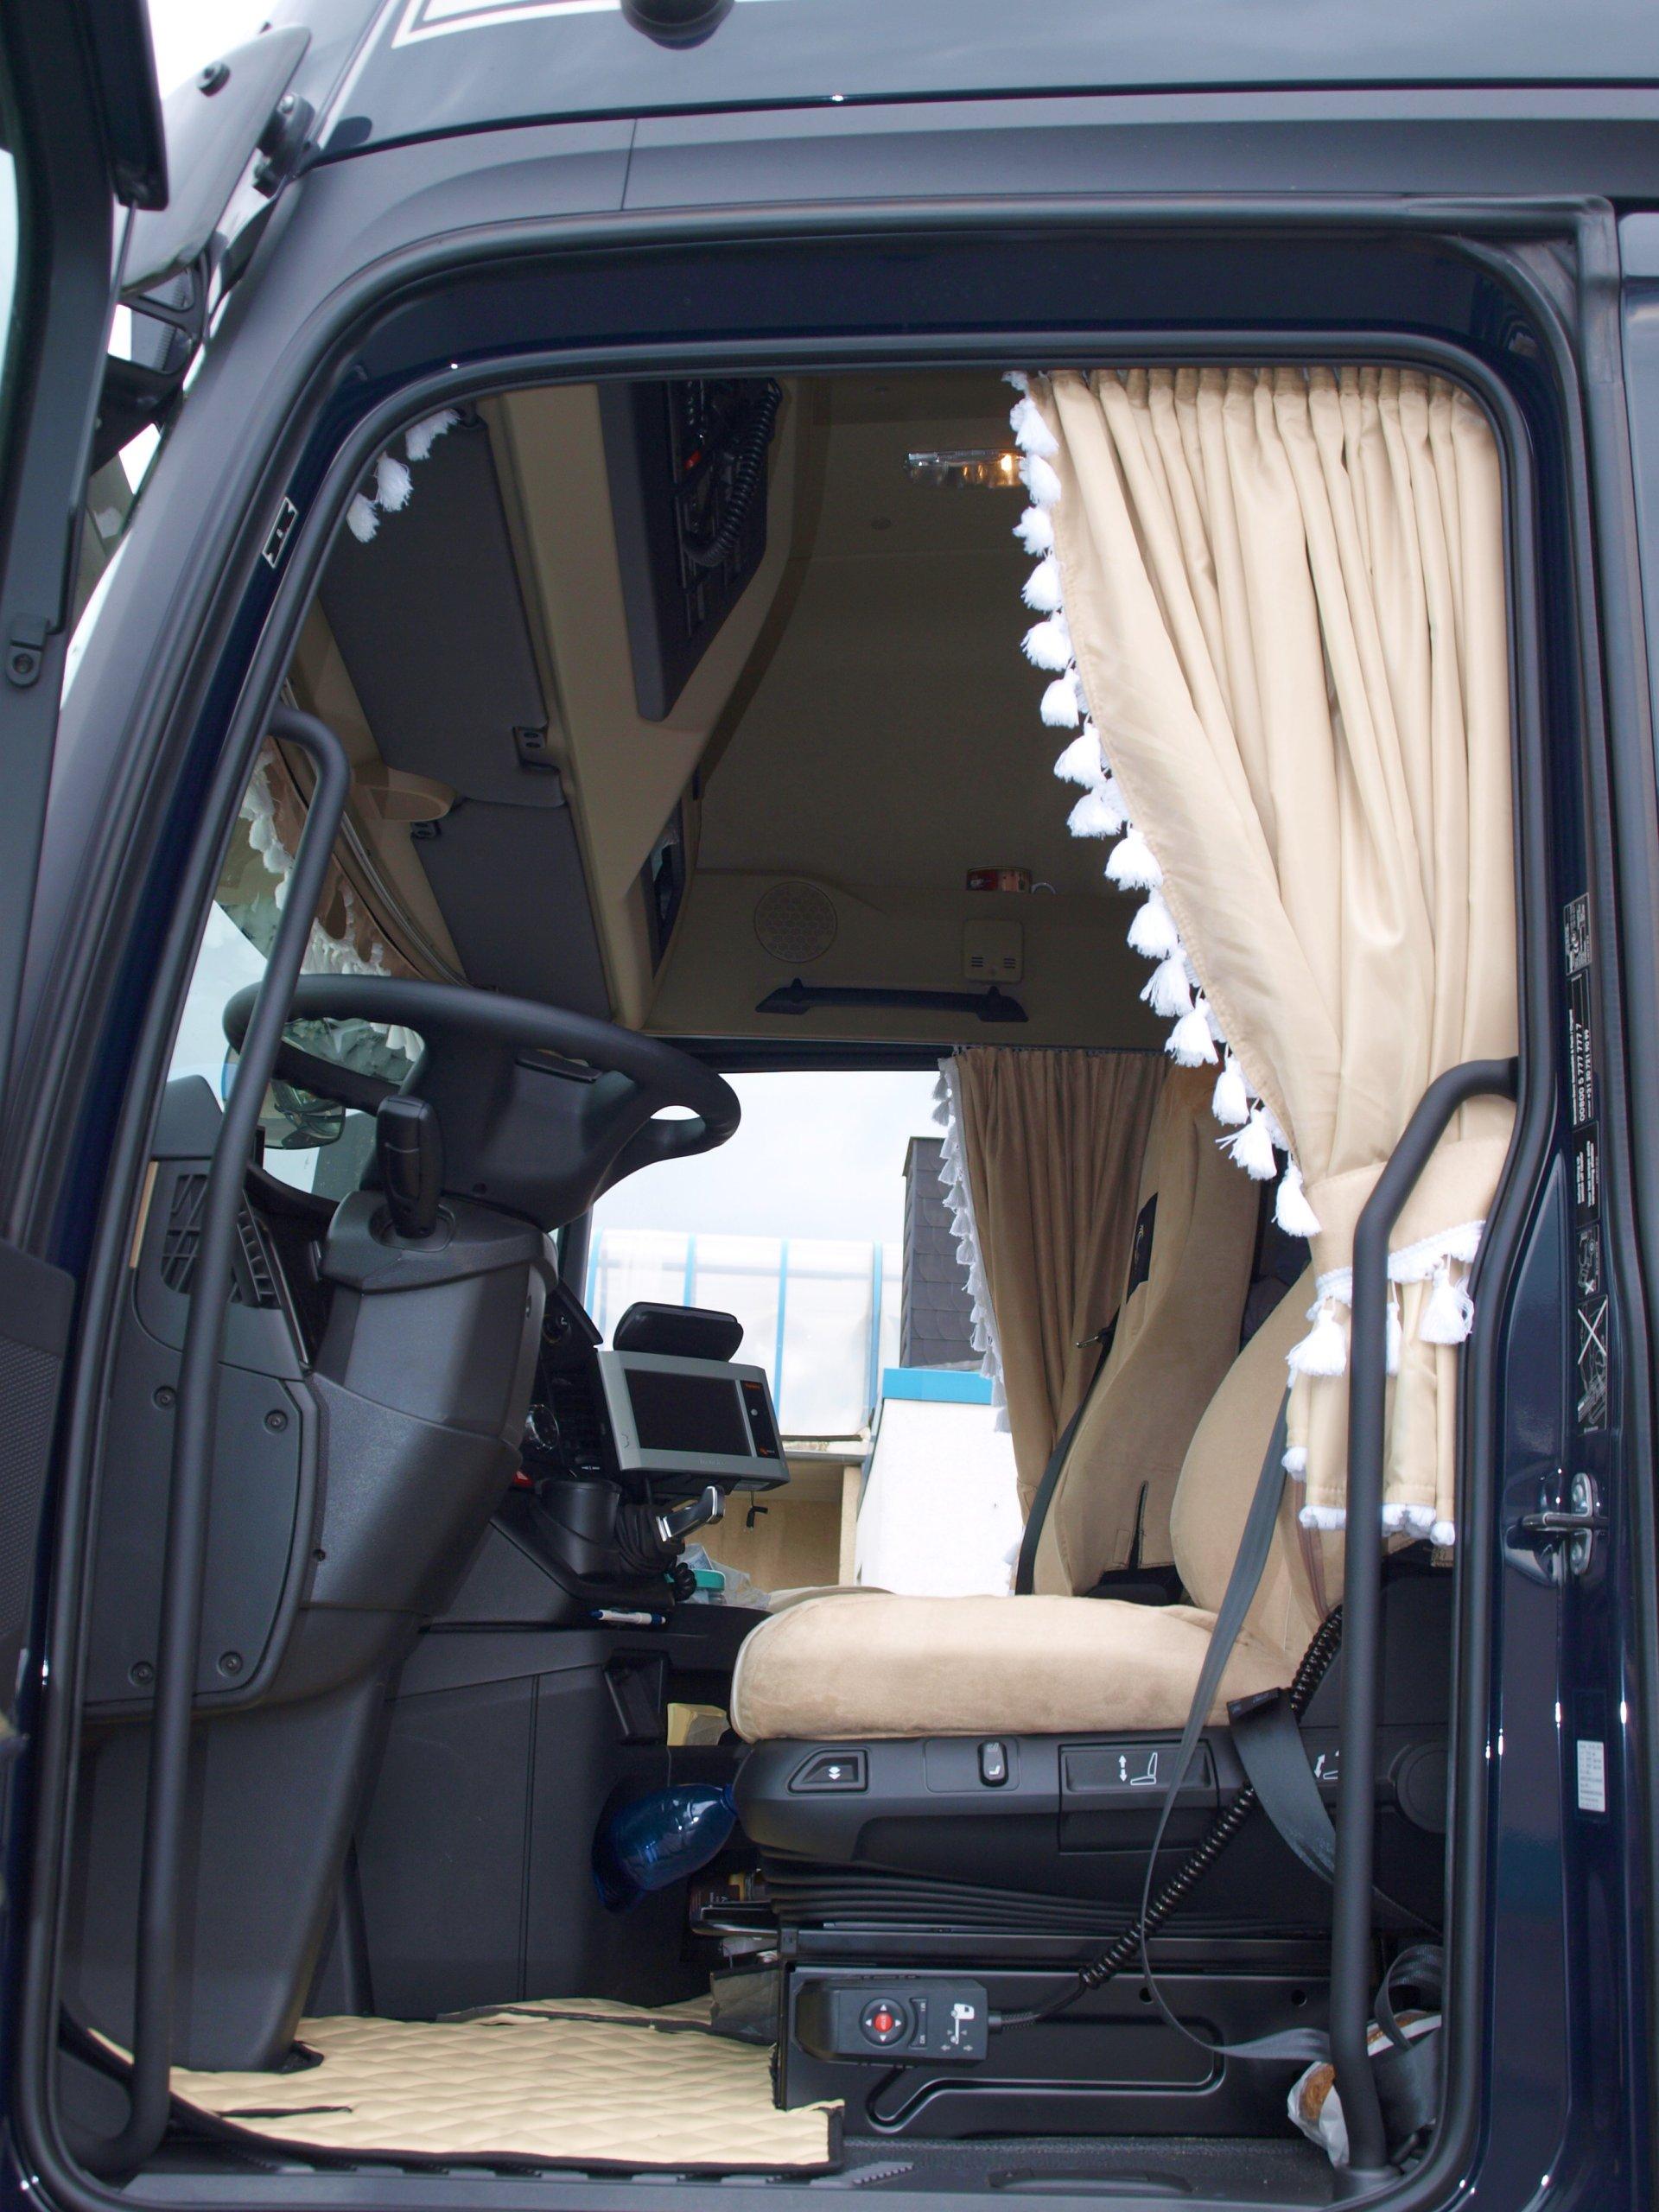 занавески для грузовиков фото кету погружаем кляр